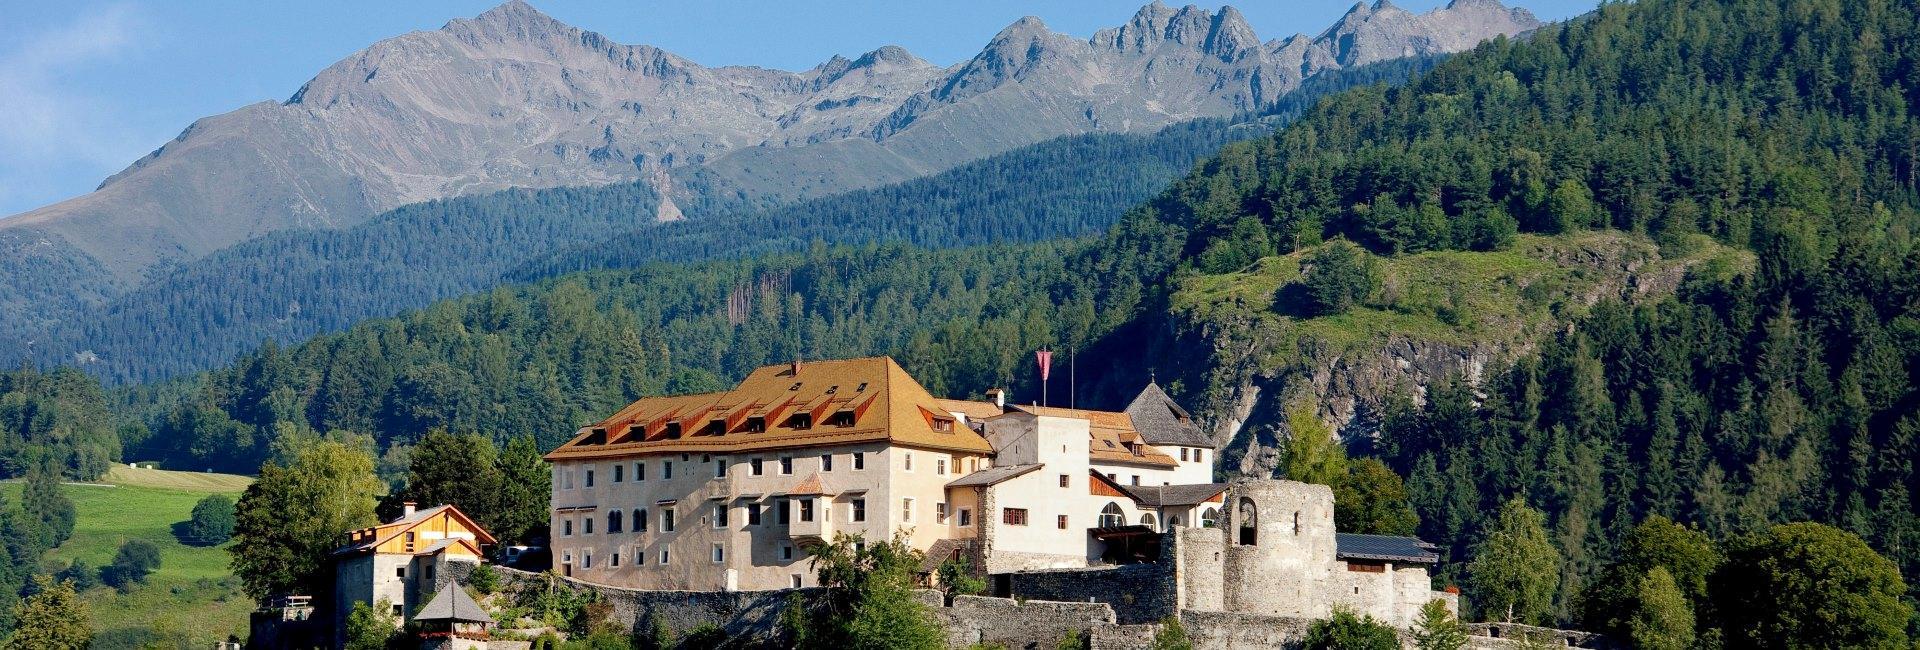 Castle Hotel Sonnenburg